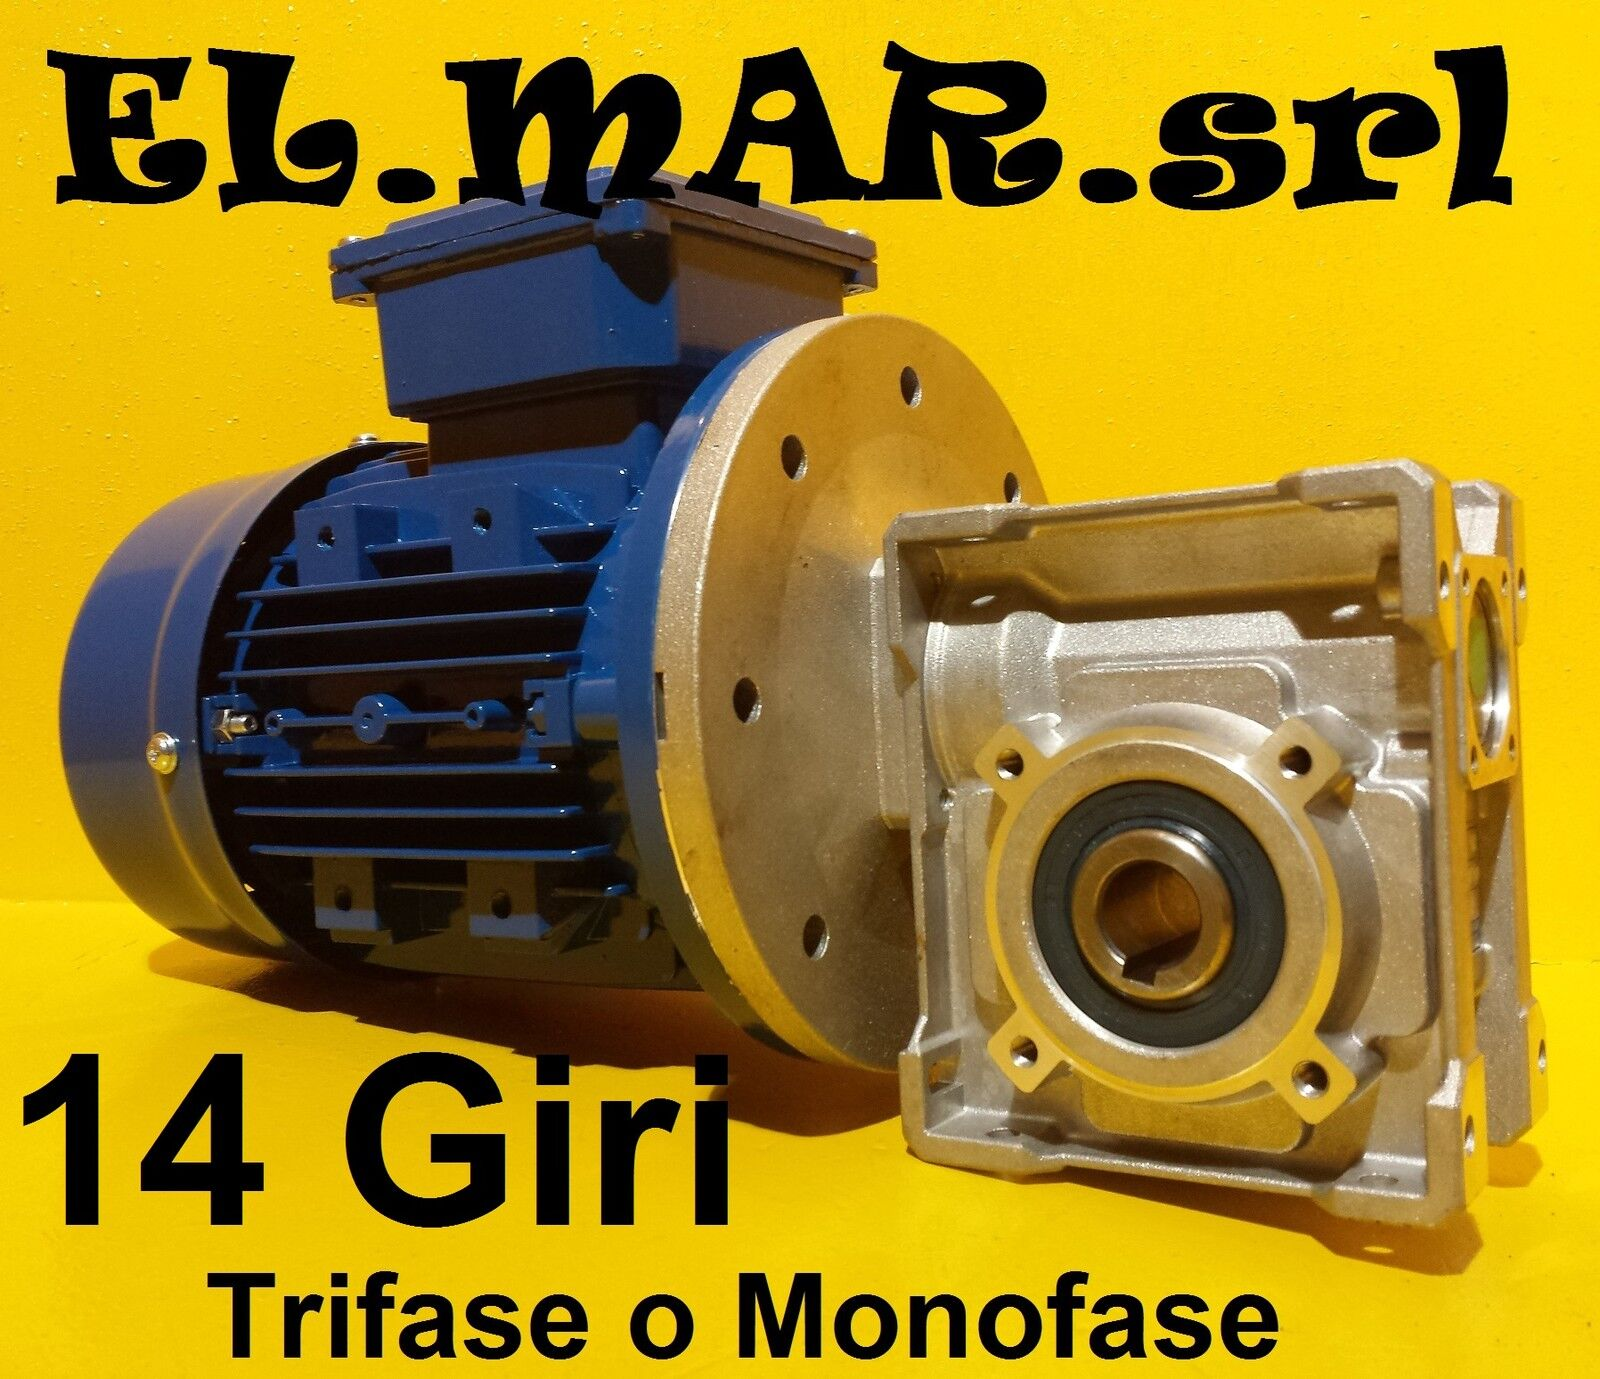 Motoriduttore 14 Giri HP 0,25 Riduttore di giri Motore Monofase Trifase Kw 0,18